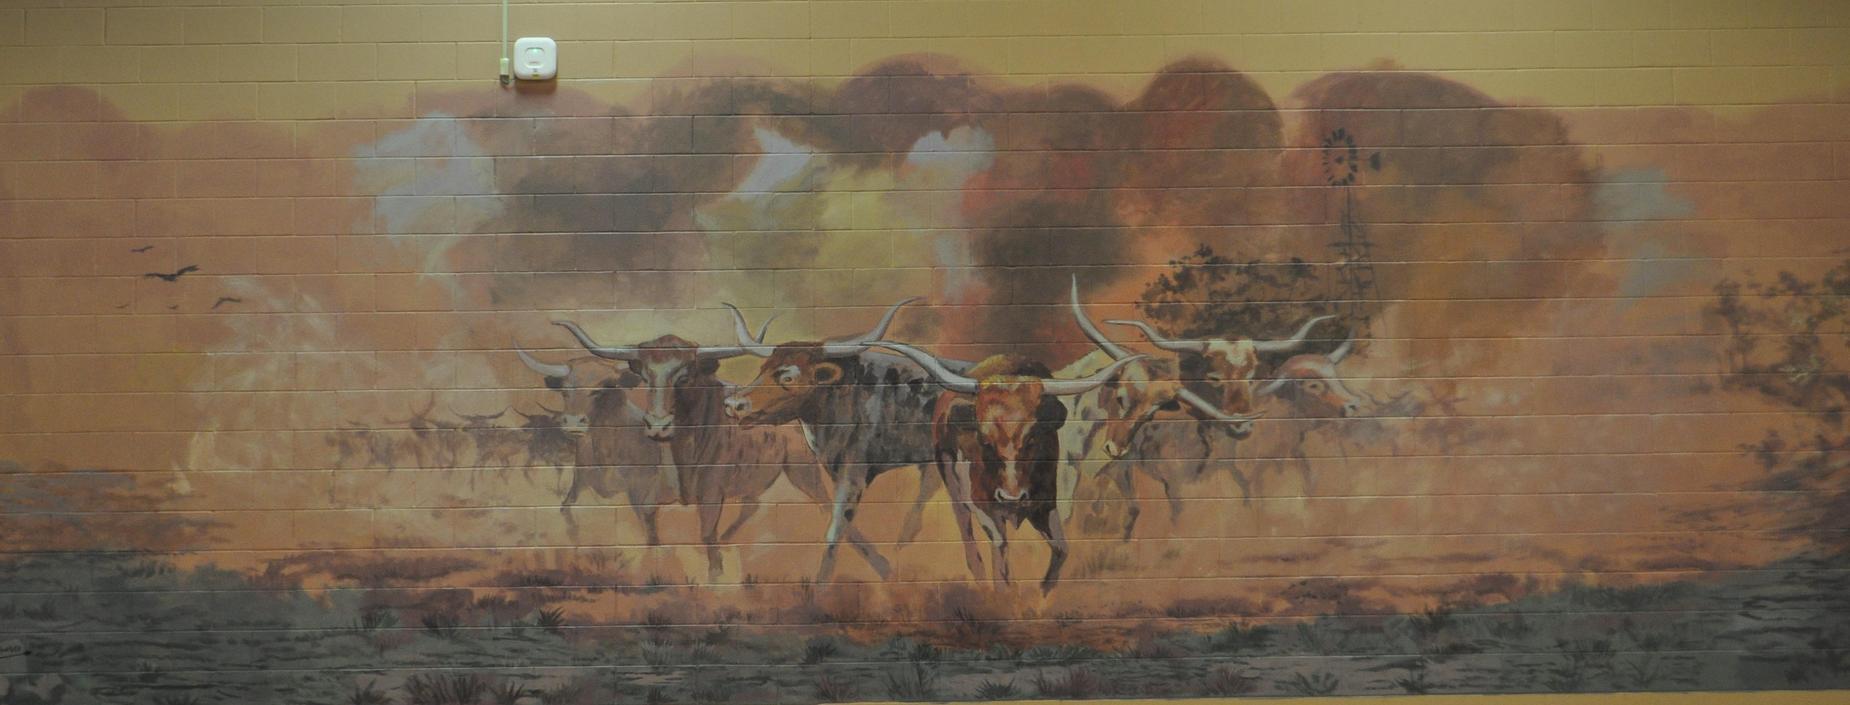 Brewster Longhorns